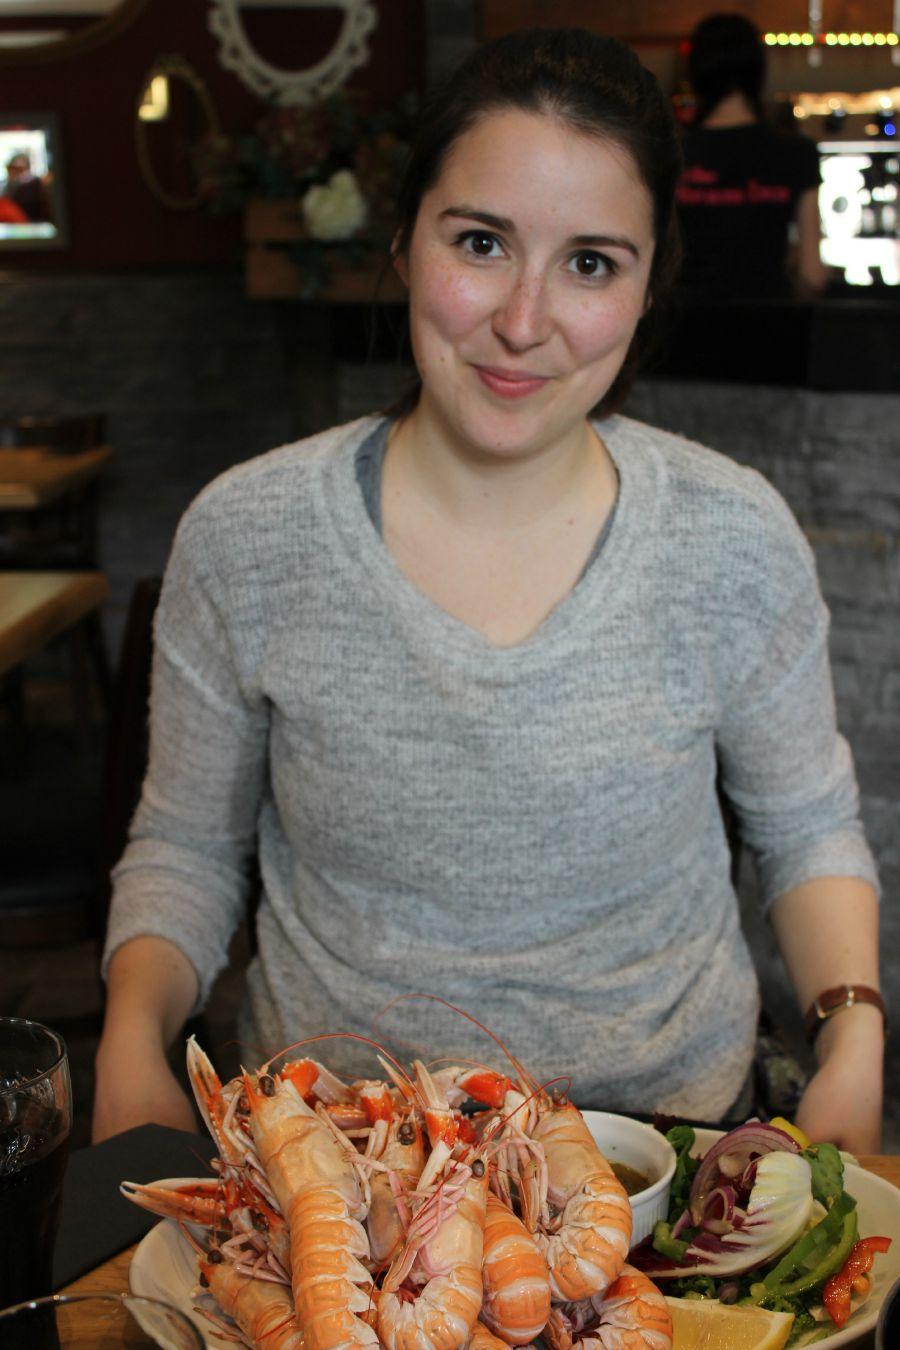 seafood mallaig